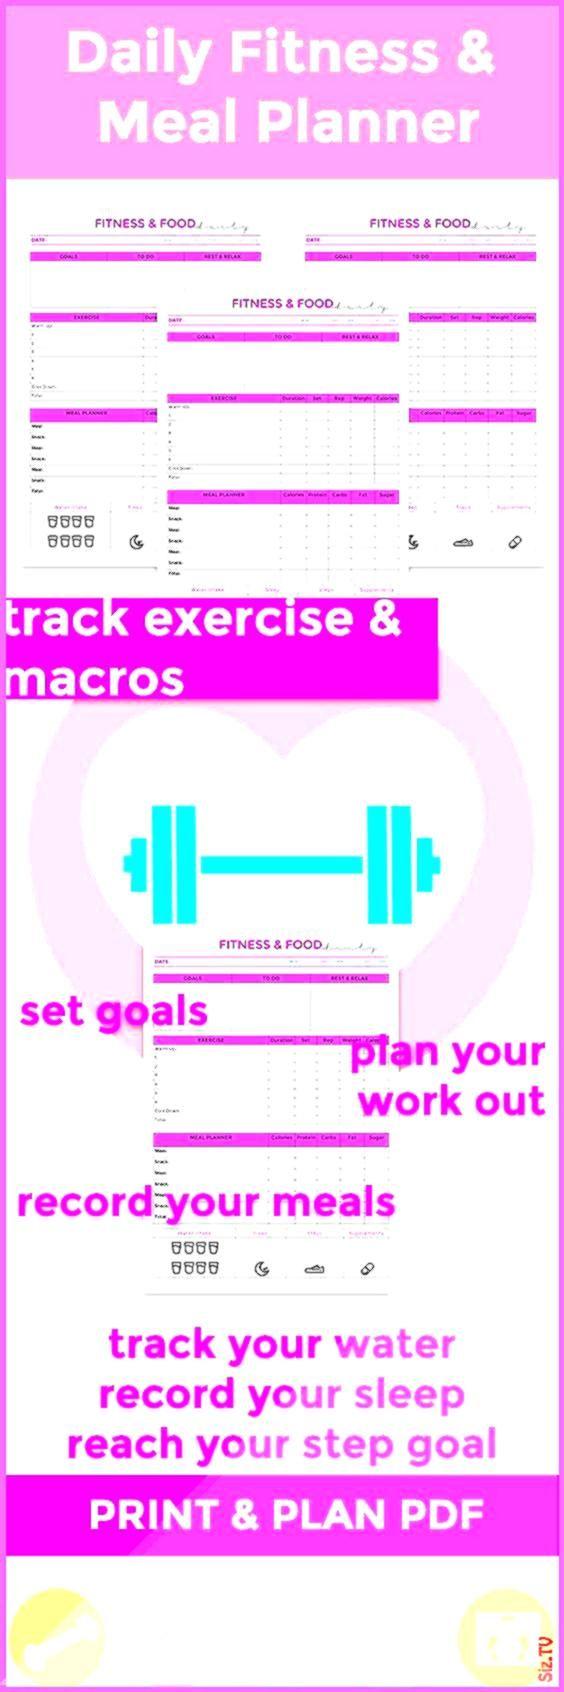 #printable #planner #workout #tracker #fitness #hellip #weekly #dianne #daily #macro #habit #goal #n...